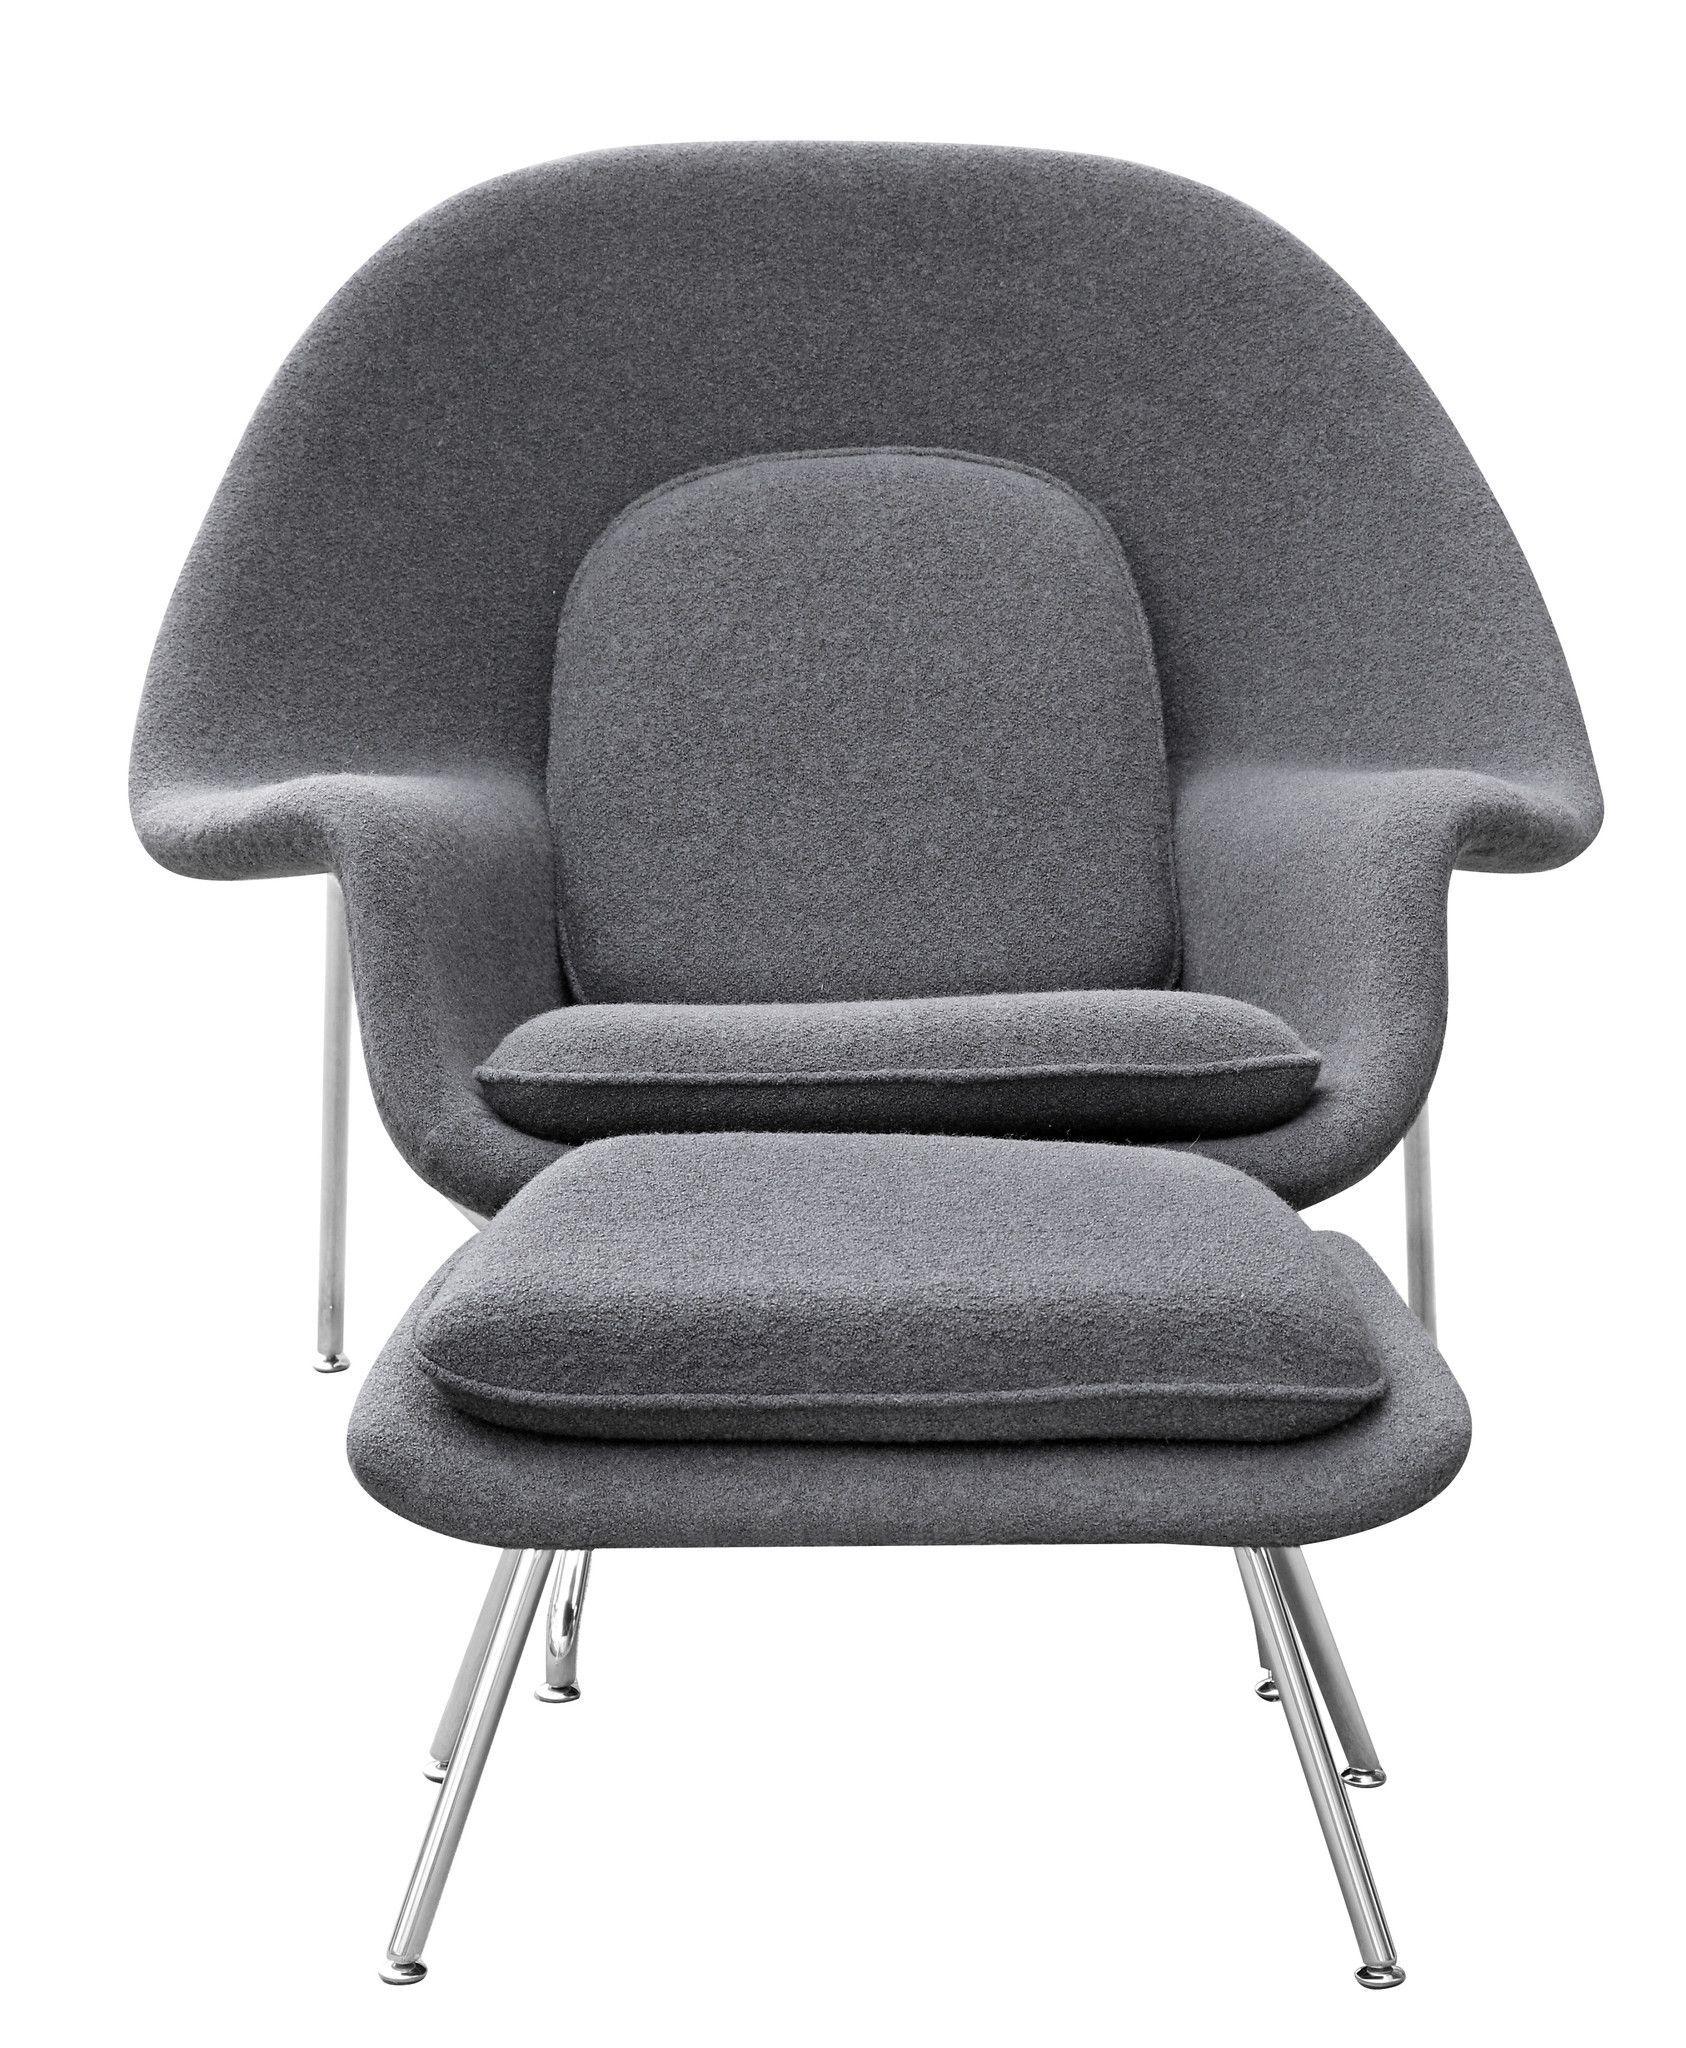 Fine Womb Style Chair And Ottoman Set In Gray For The Home Creativecarmelina Interior Chair Design Creativecarmelinacom